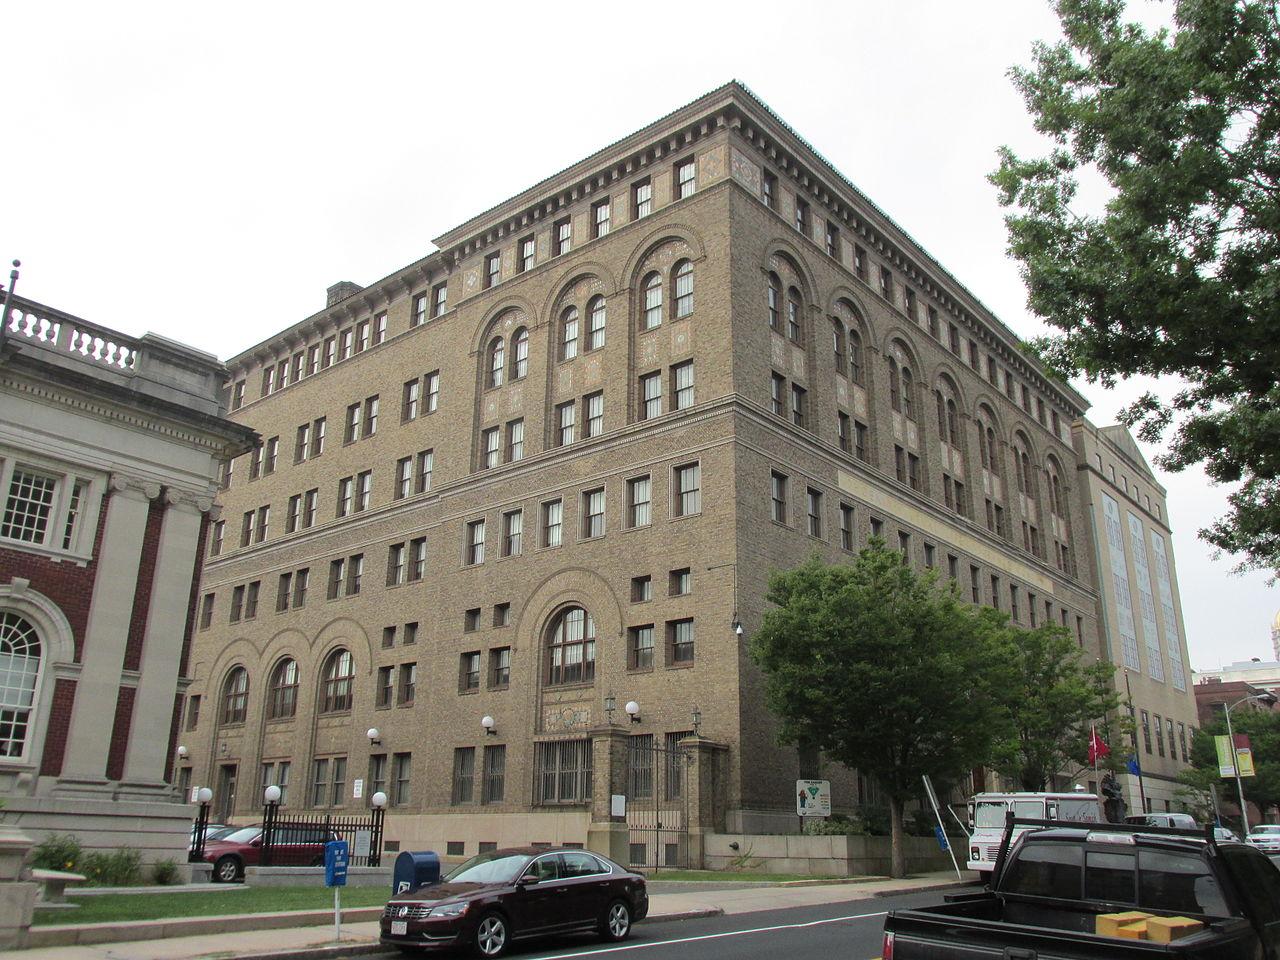 Connecticut Mutual Life Insurance Company